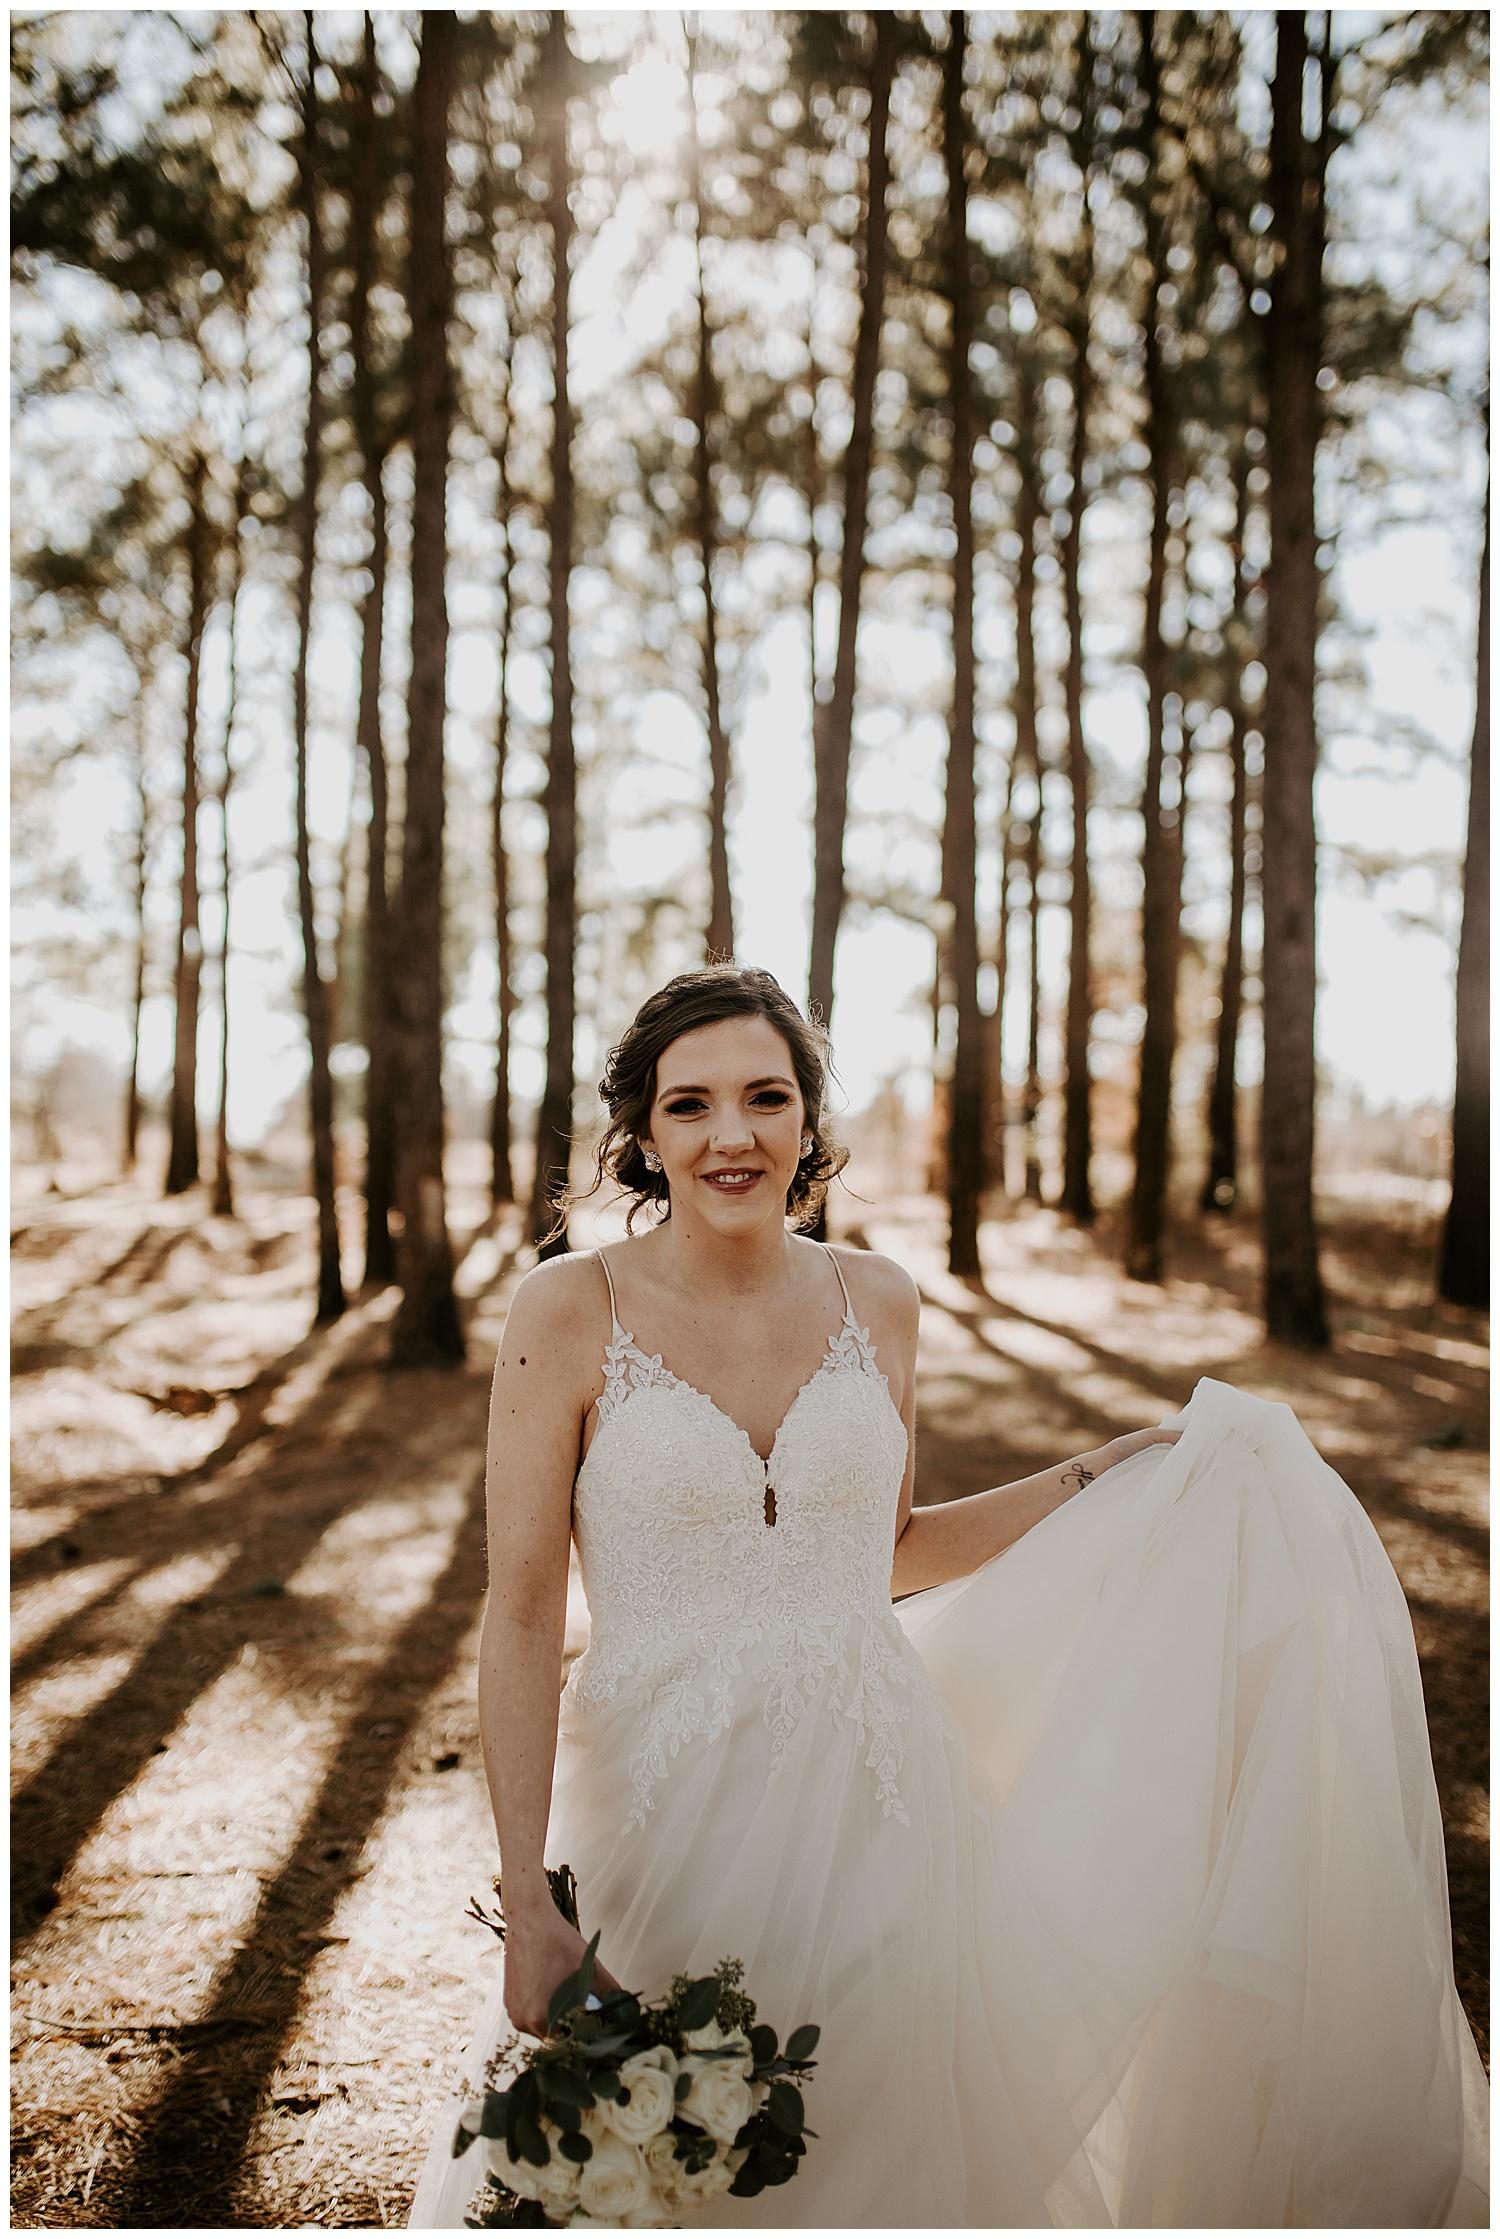 Laken-Mackenzie-Photography-Cheyenne-Bridal-Session-Dallas-Fort-Worth-Wedding-Photographer08.jpg